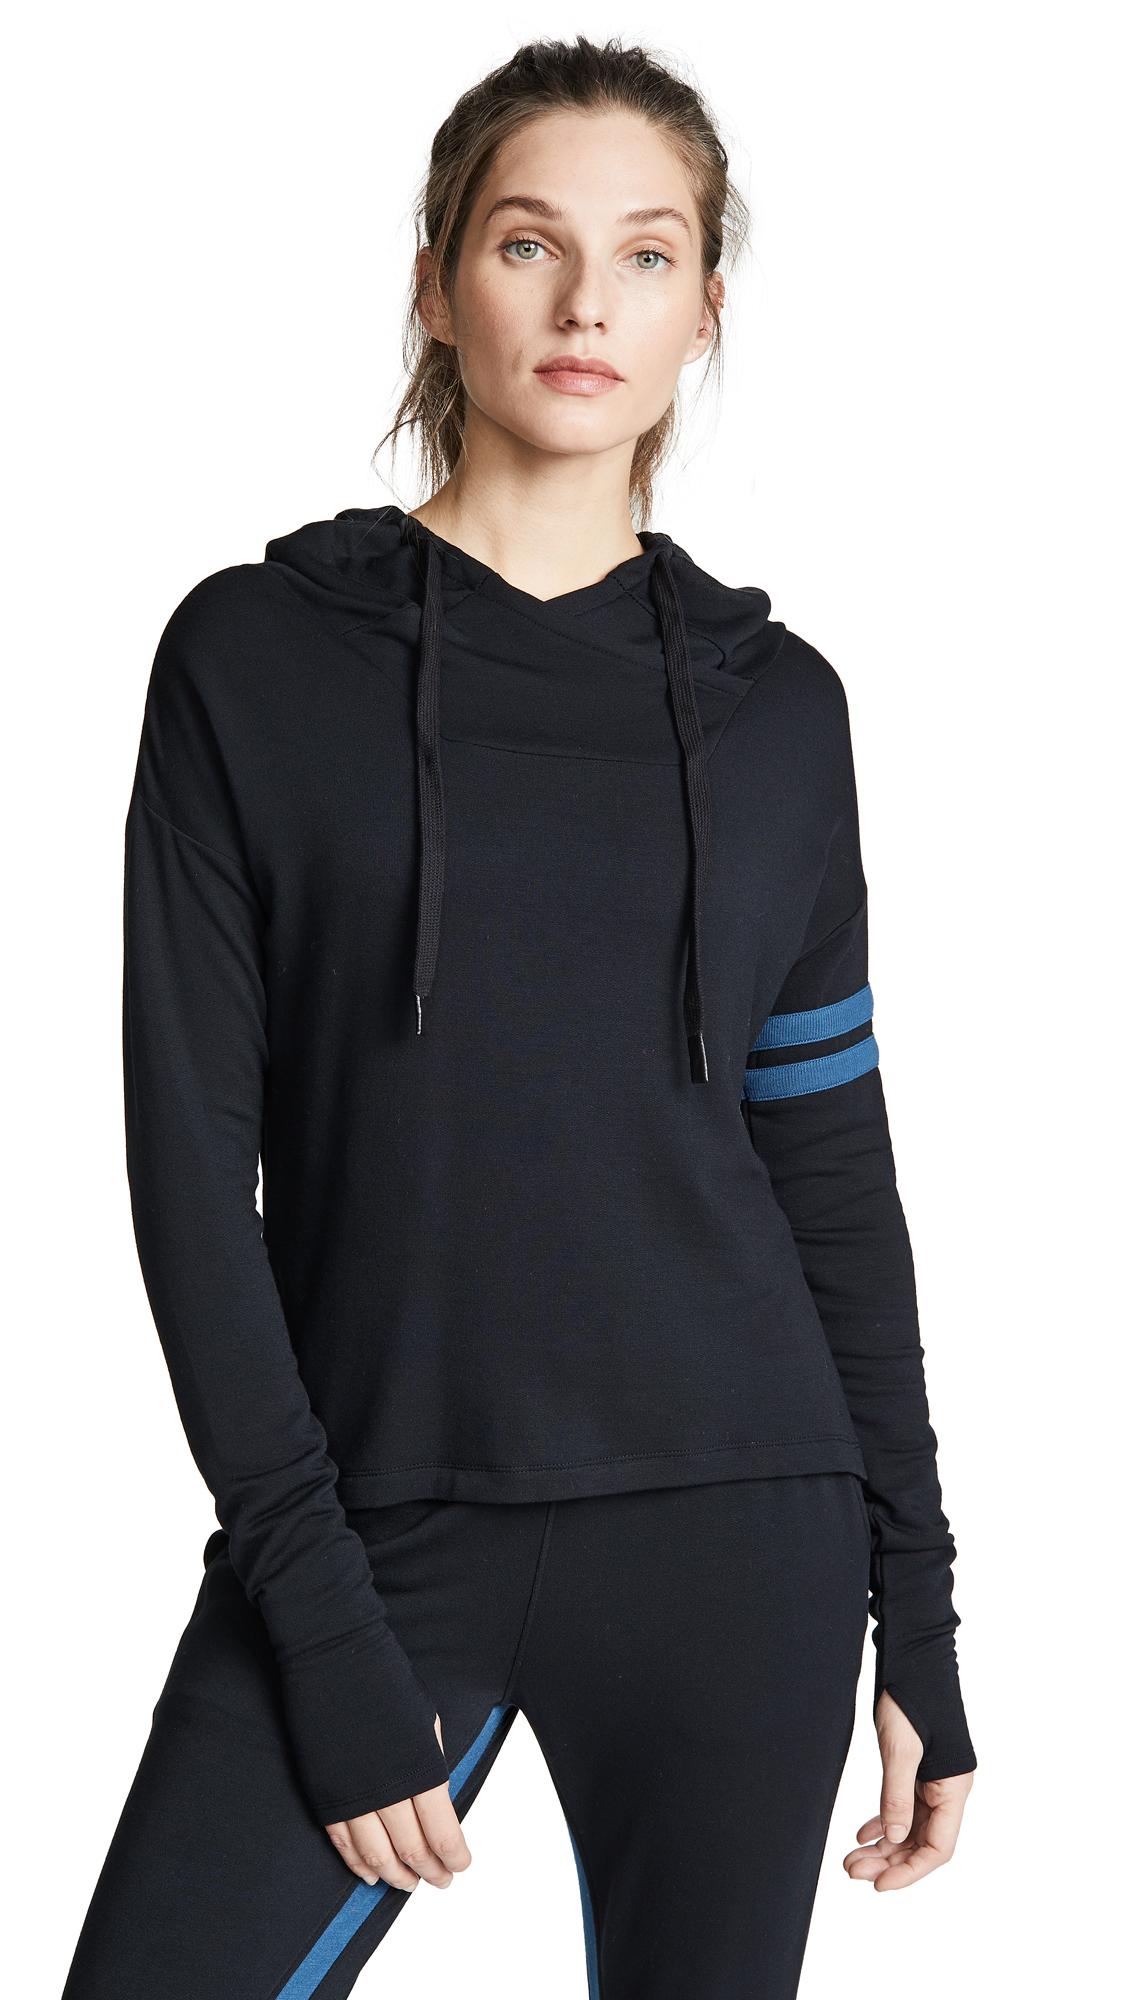 SPLITS59 Apres Pullover in Black/Dusty Blue